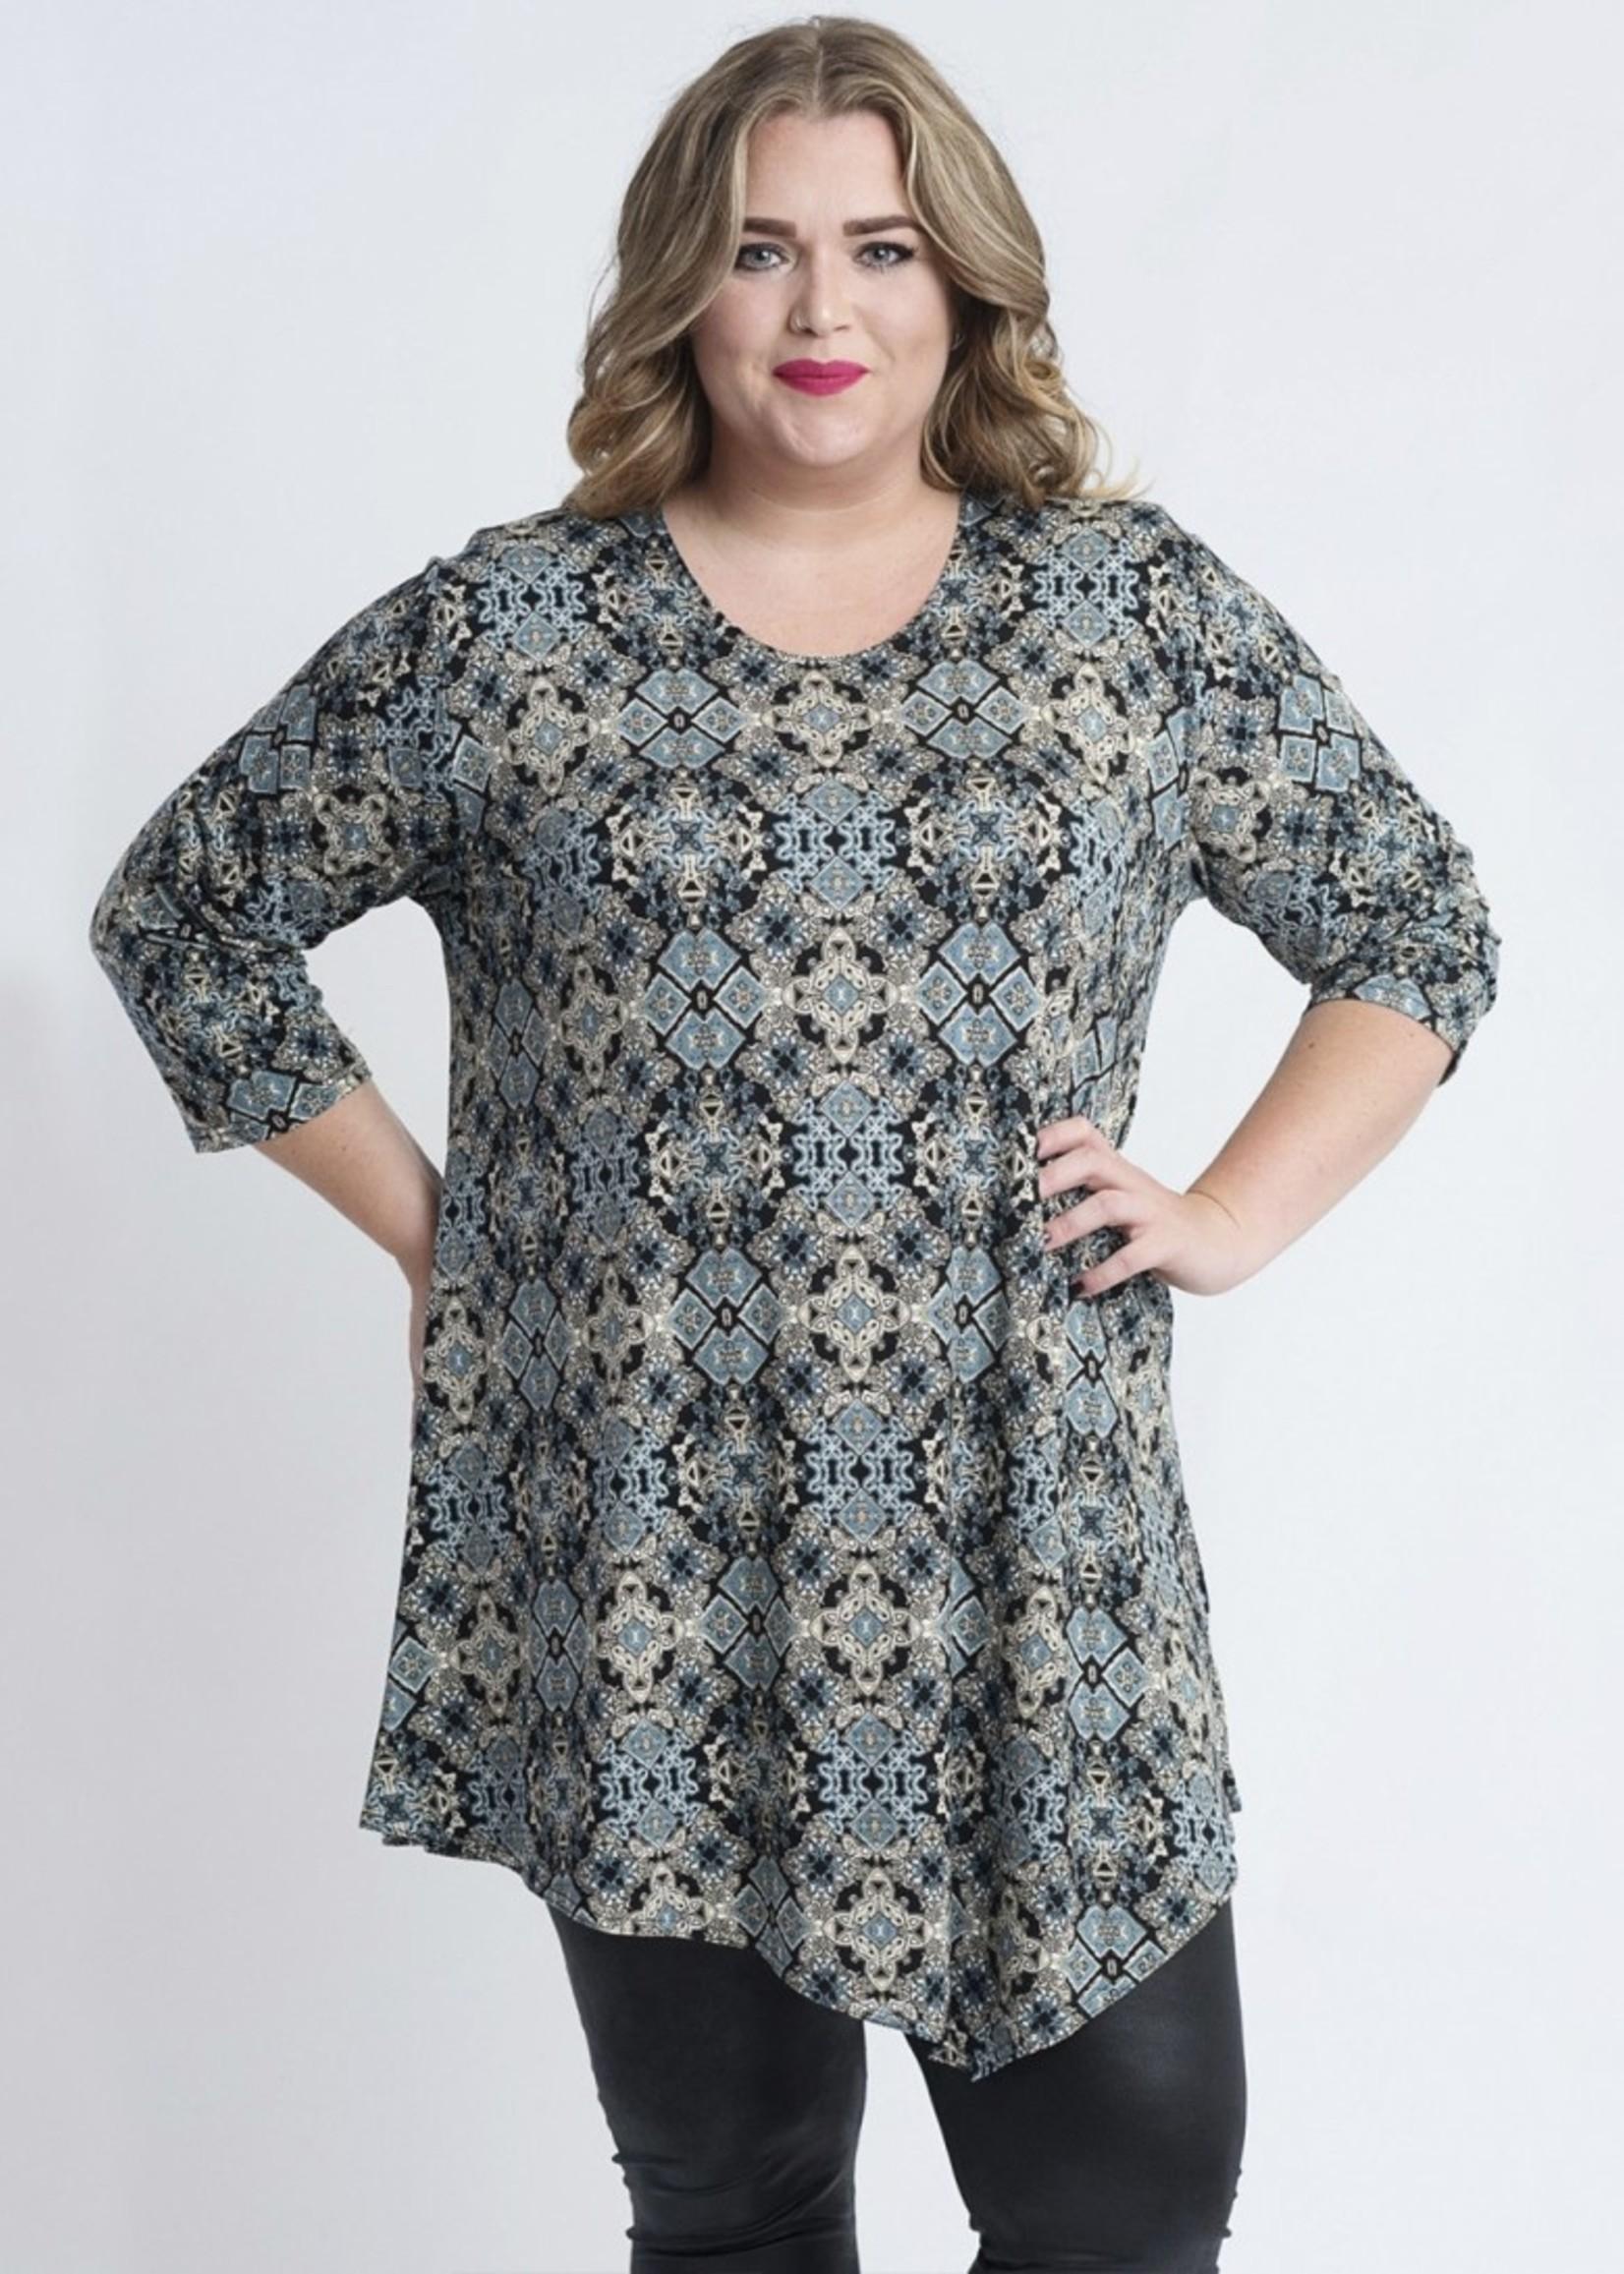 Magna Fashion Shirt B93 PRINT